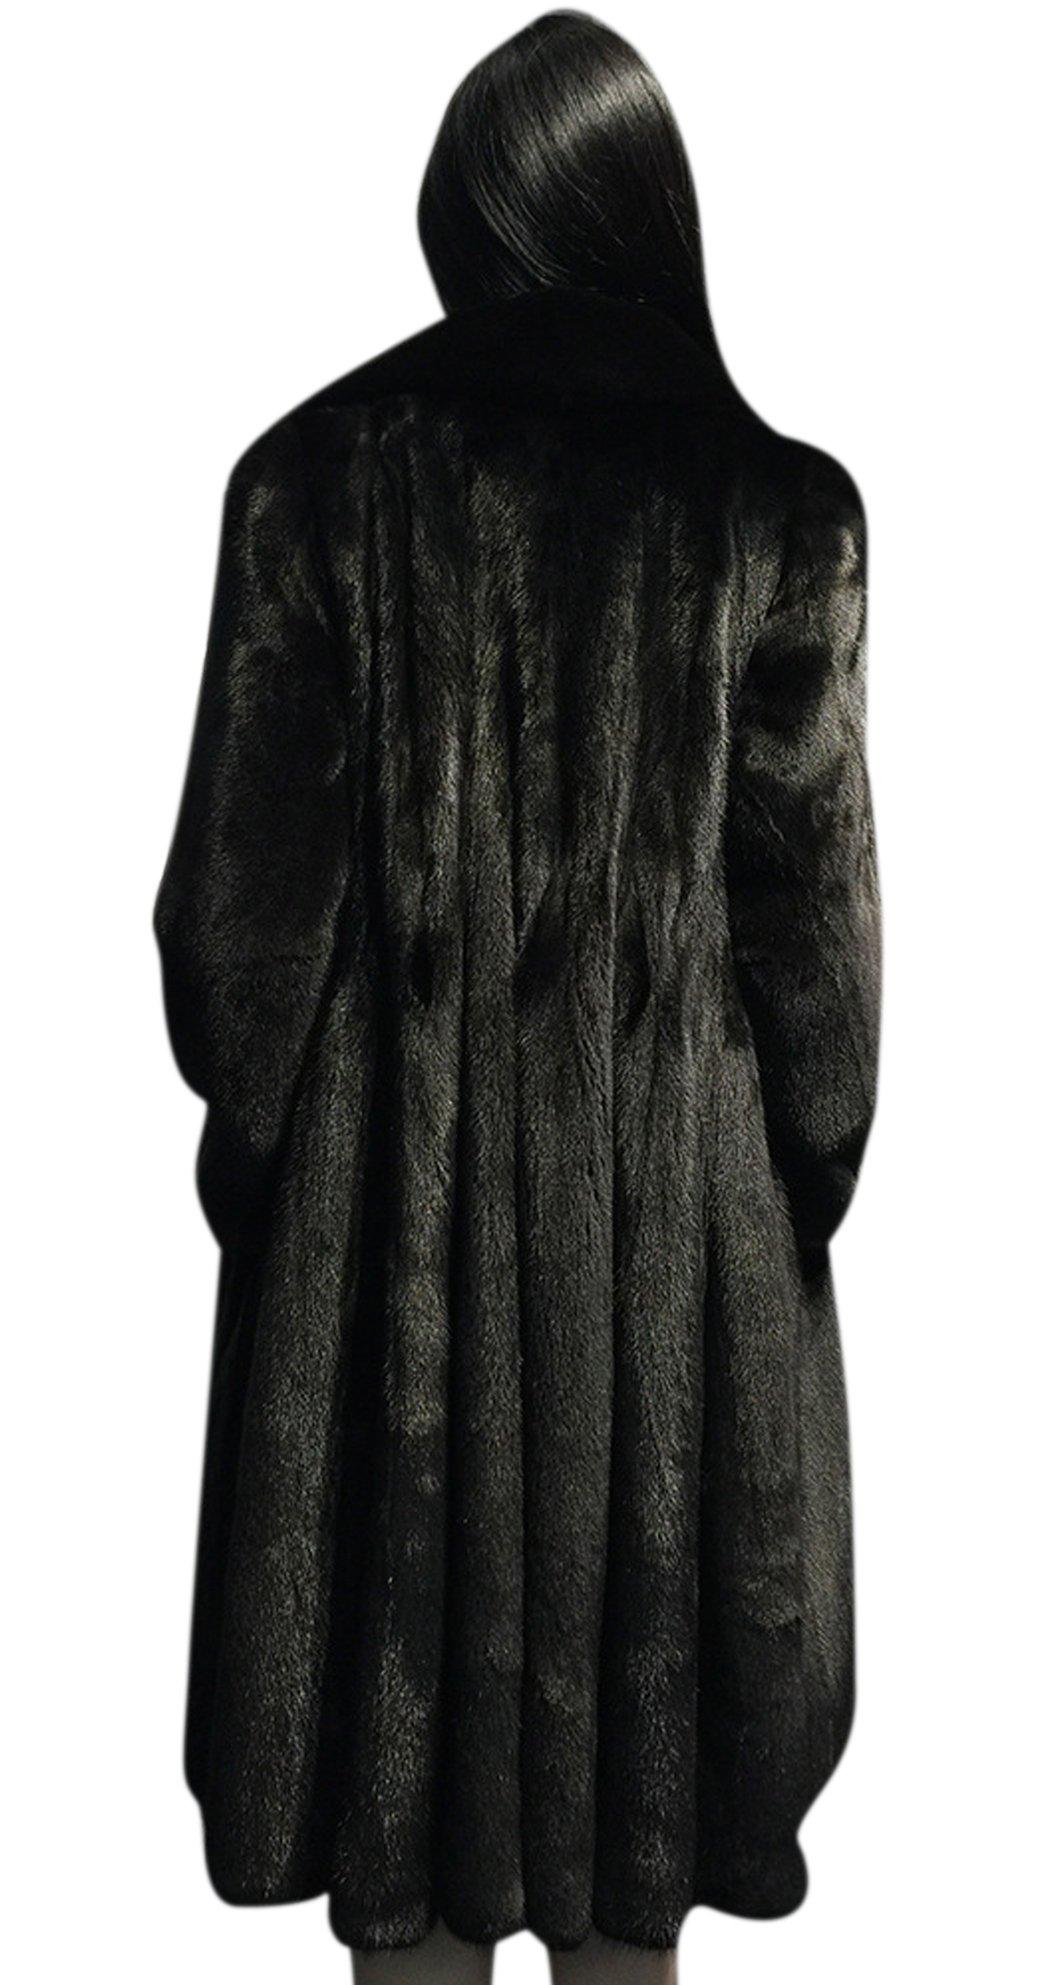 AZIZY Women's Black Luxury Faux Mink Fur Slim Lapel Long Sleeve Thick Warm Maxi Coat 2XL by AZIZY (Image #2)